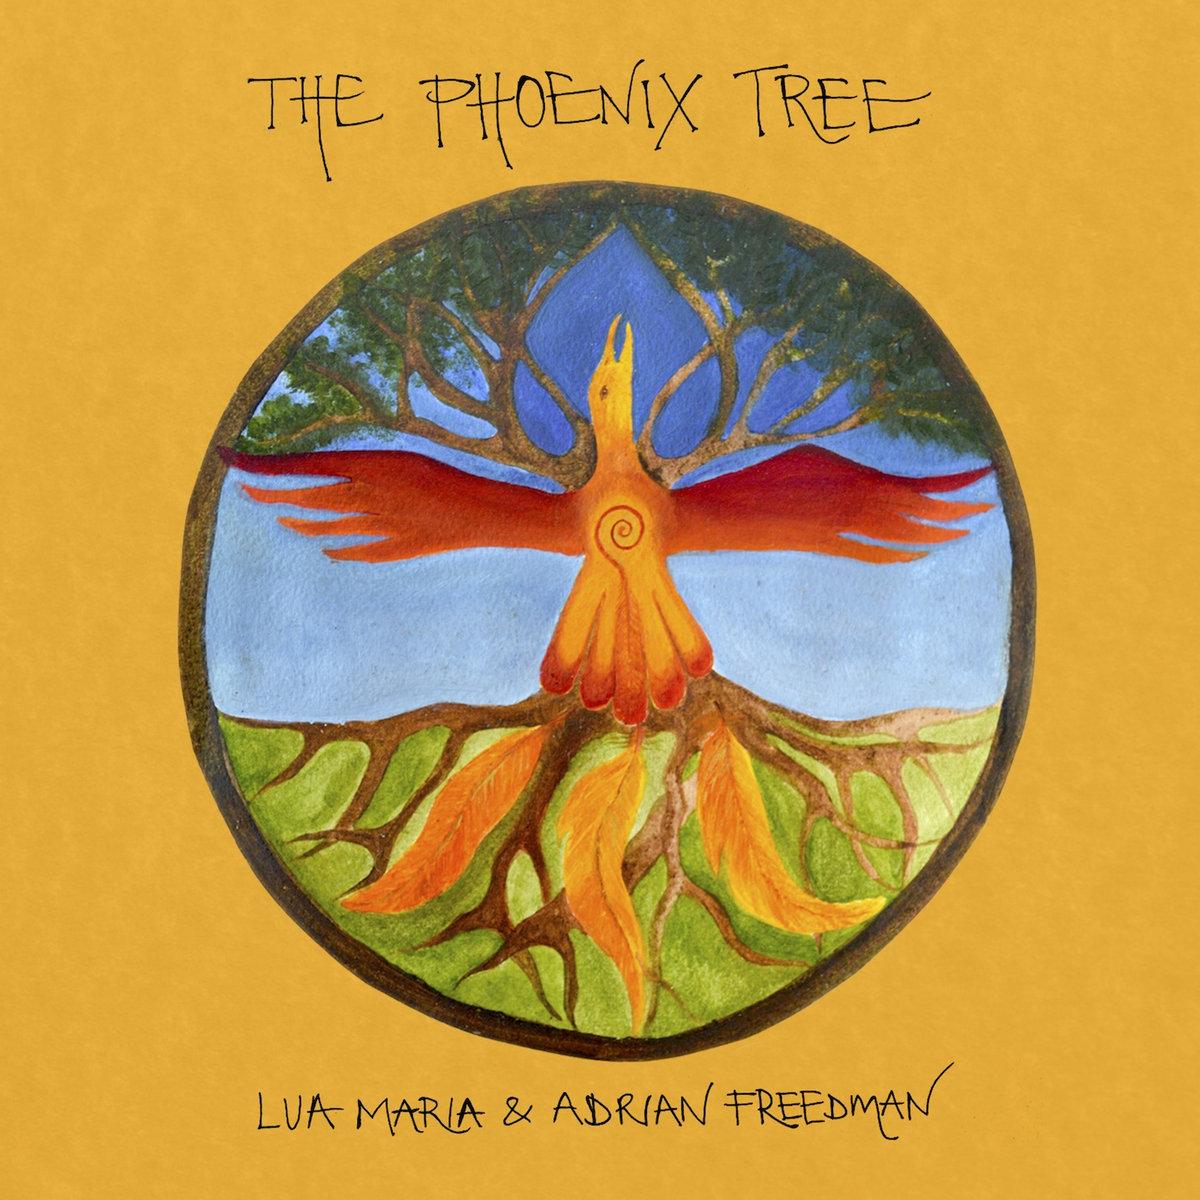 Lotus flower adrian freedman from the phoenix tree by lua maria and adrian freedman izmirmasajfo